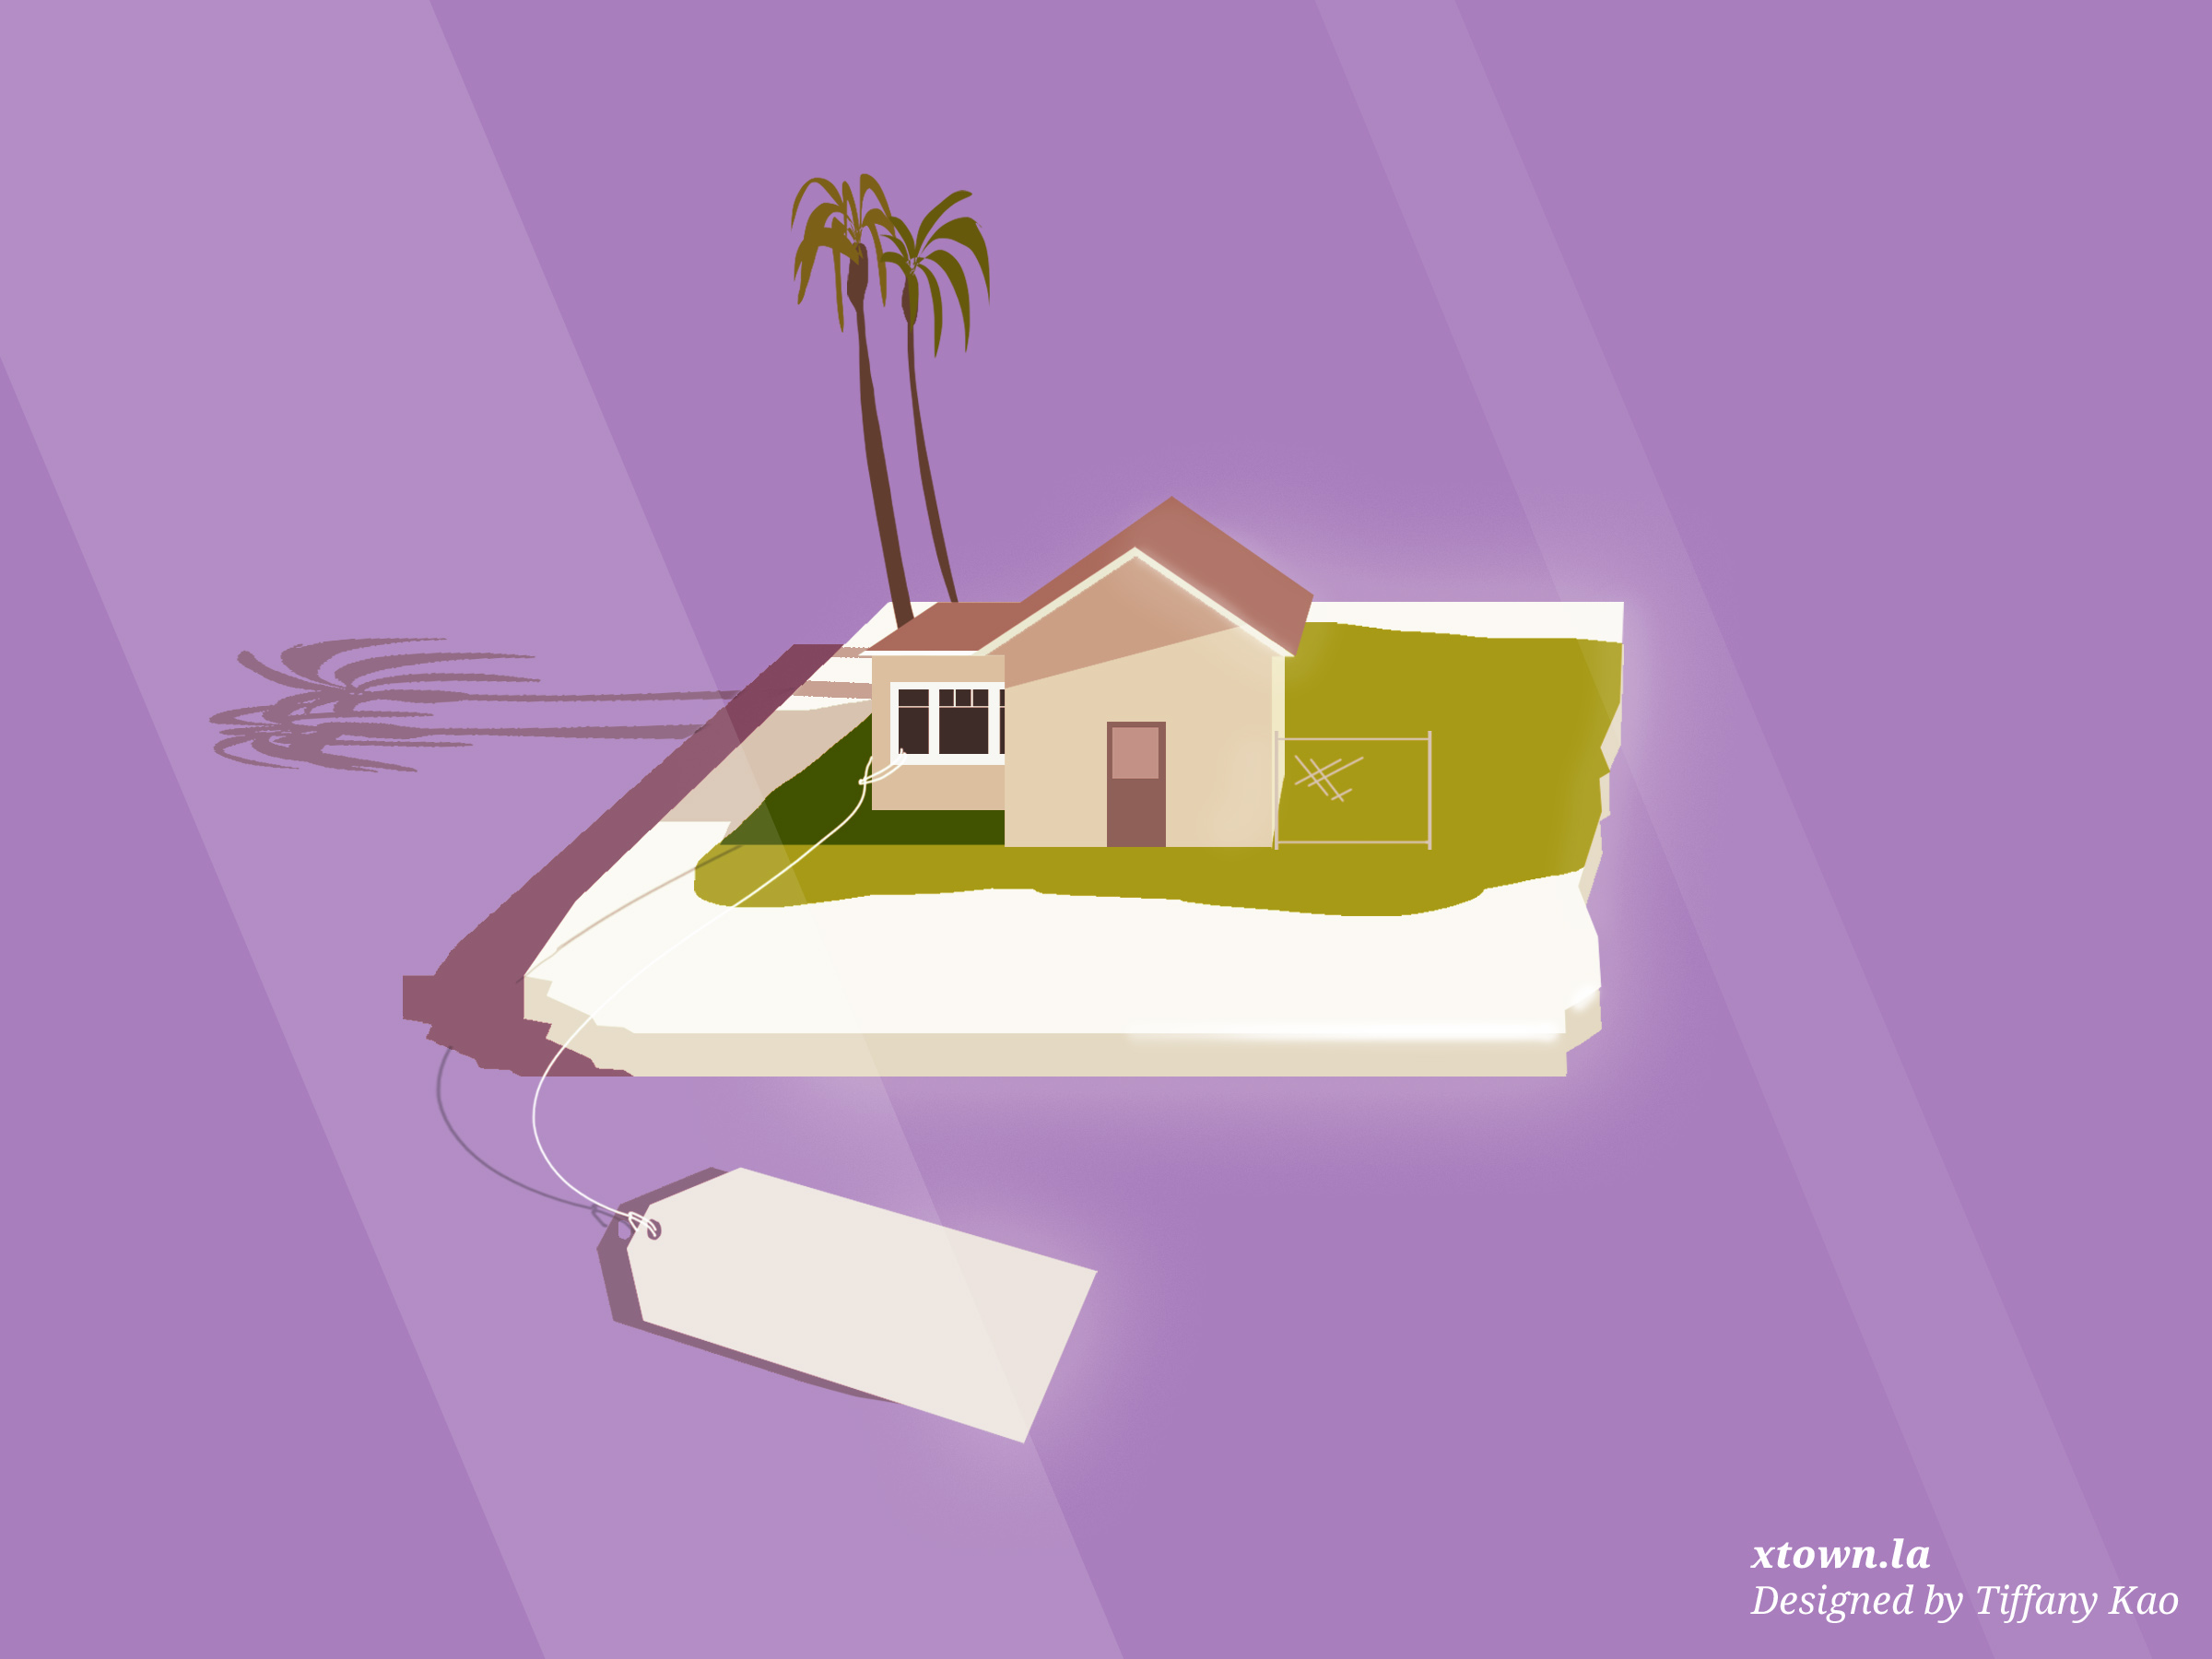 Illustration of Los Angeles's rising housing market